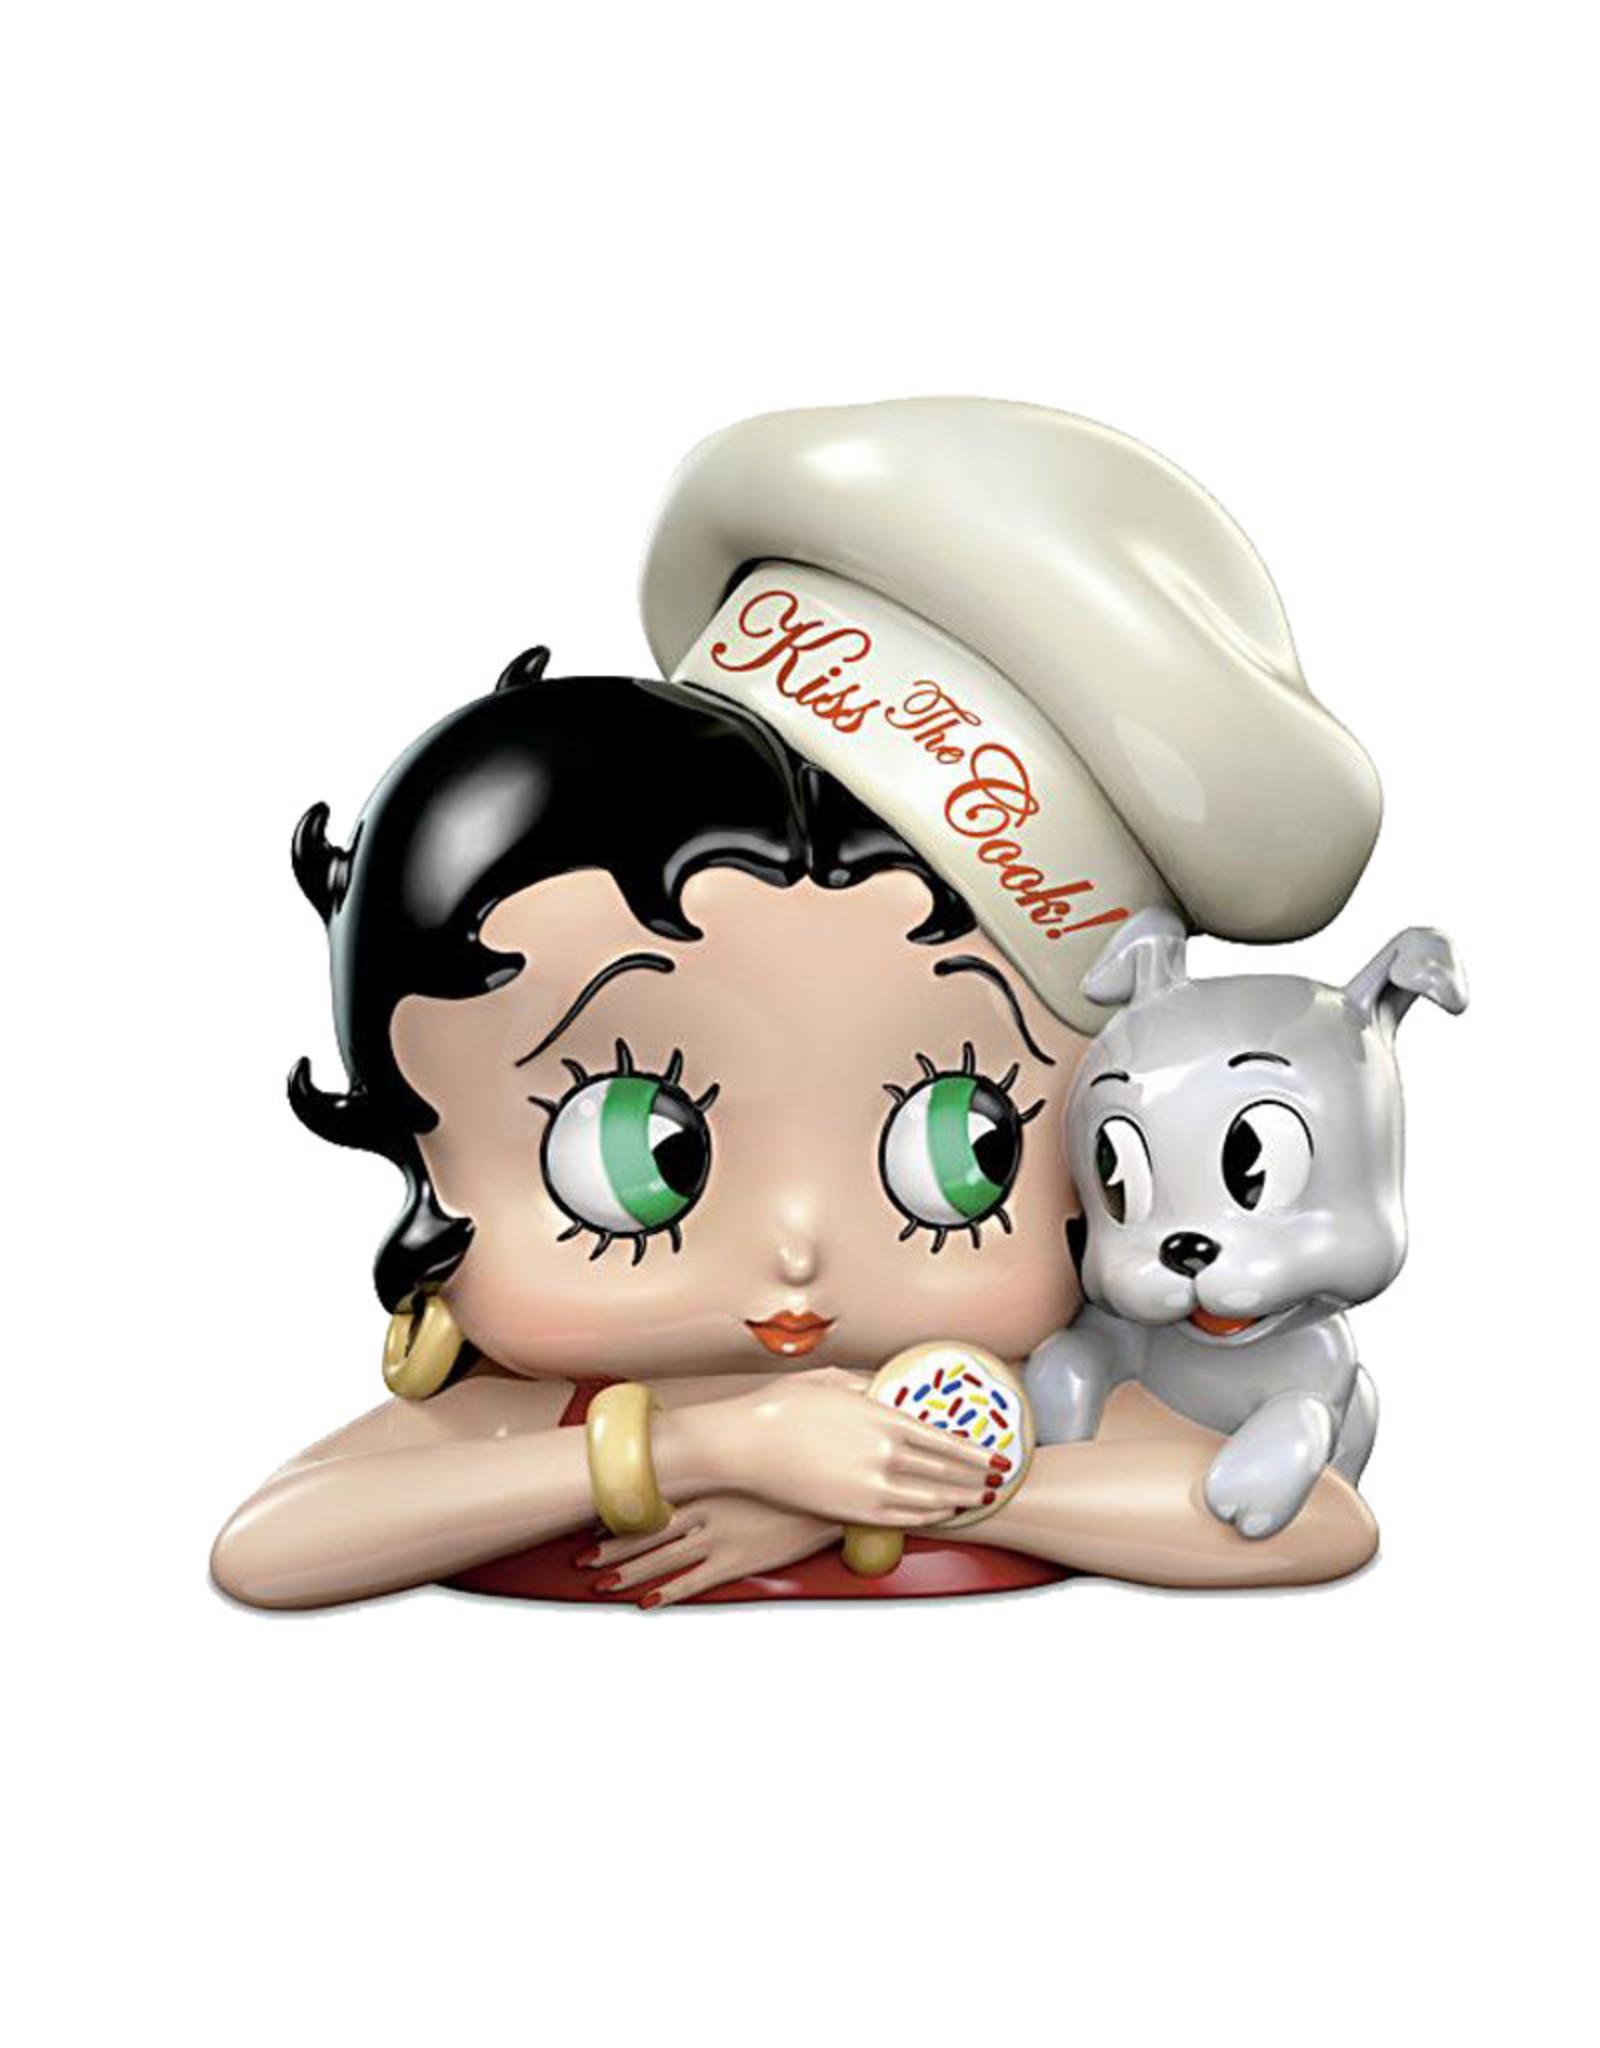 Betty Boop Betty Boop ( Cookie Jar ) Kiss The Cook